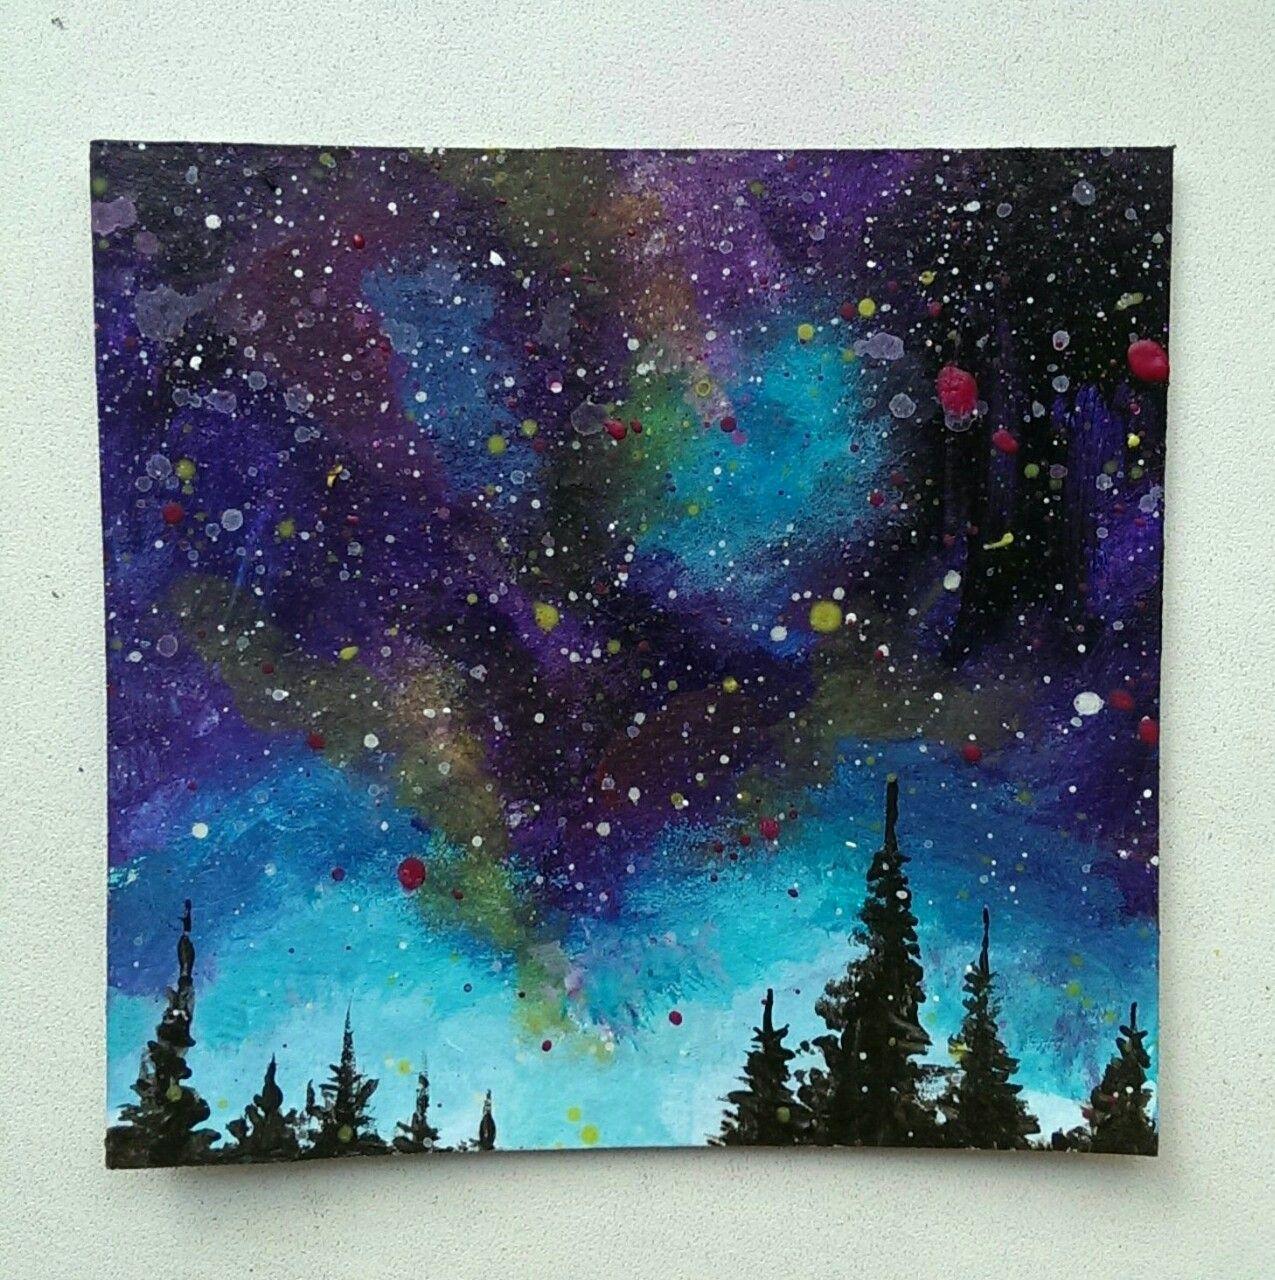 Galaxy Sky by Julia Bullet | paintings | Pinterest ...